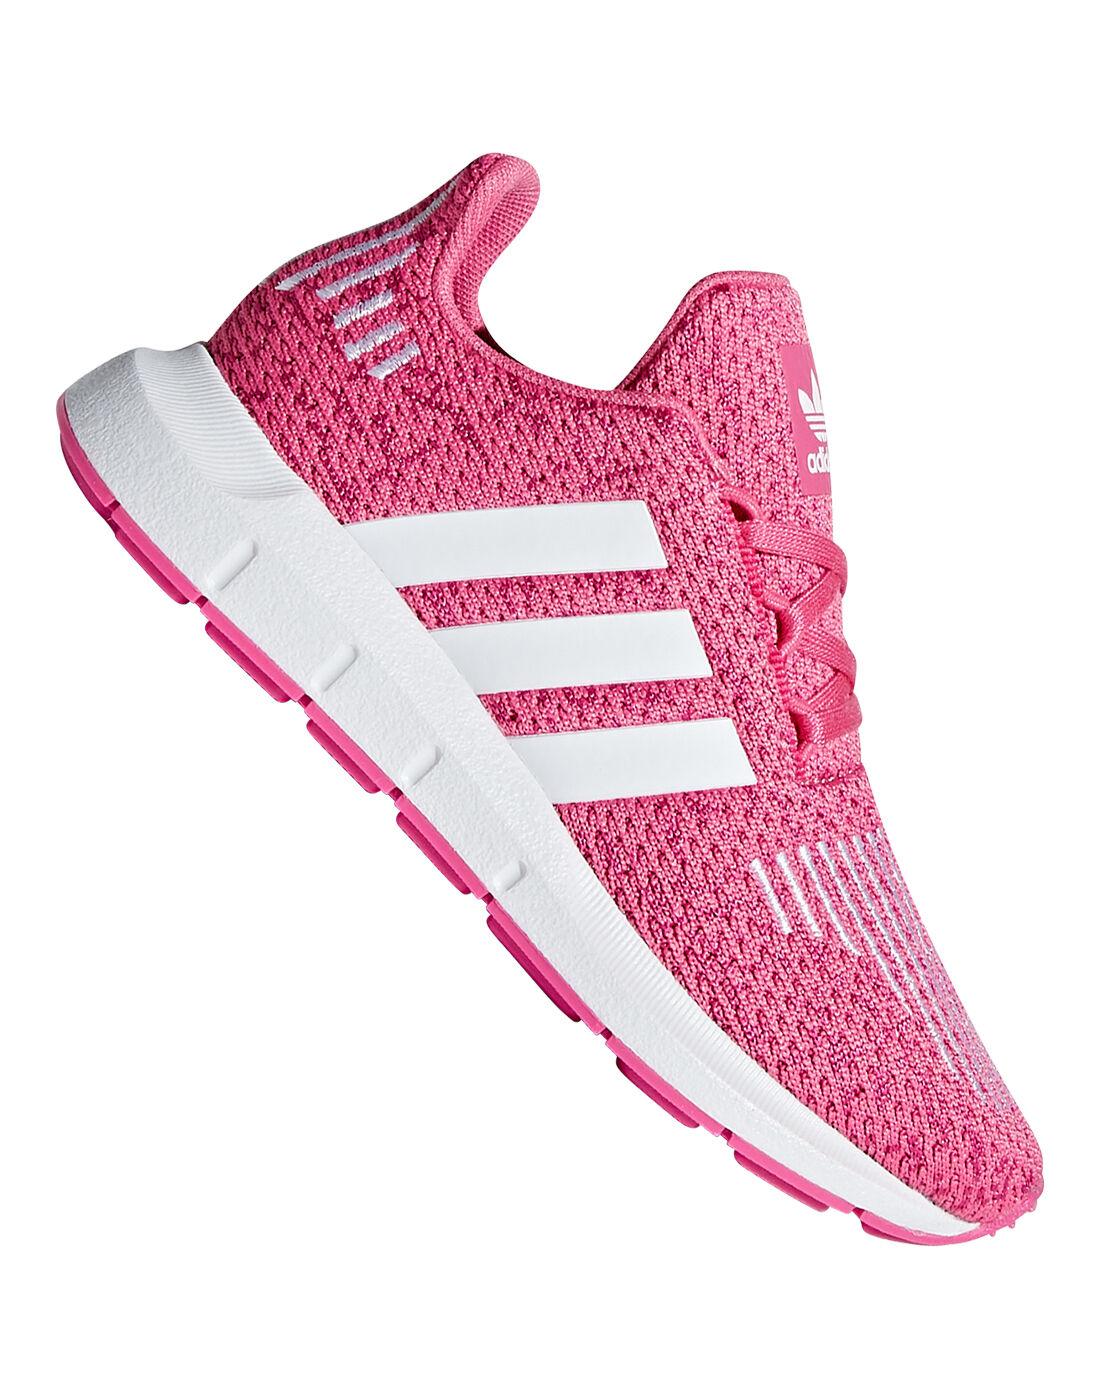 Pink adidas Originals Swift Runs